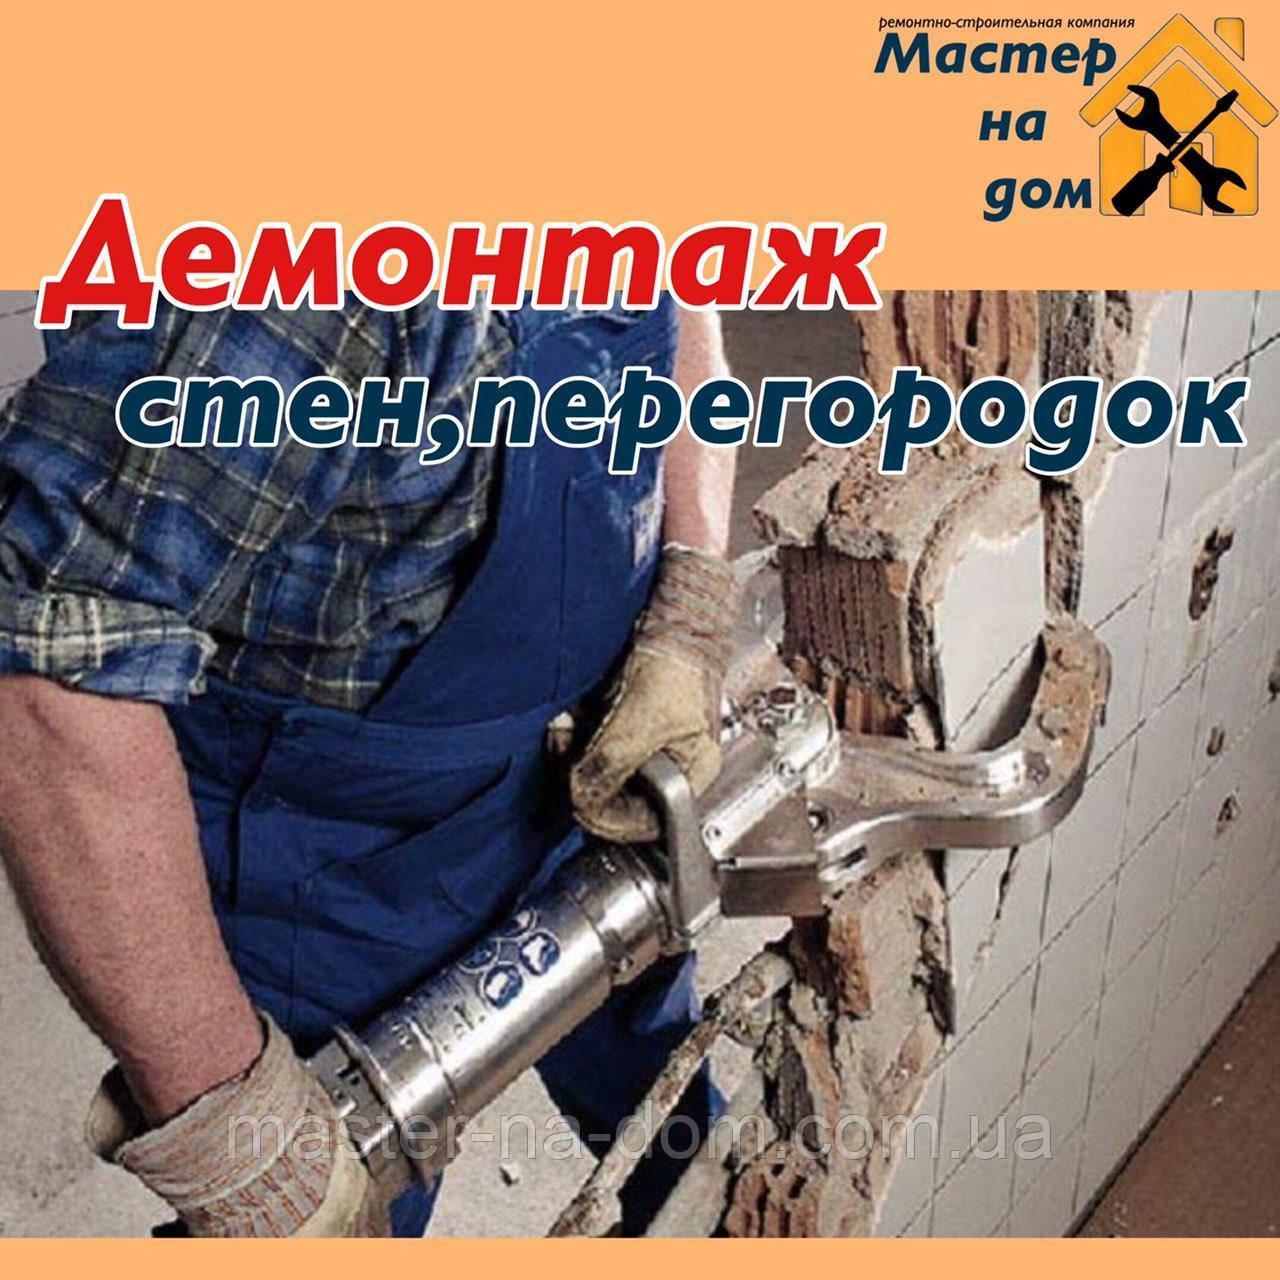 Демонтаж стен, перегородок в Черновцах